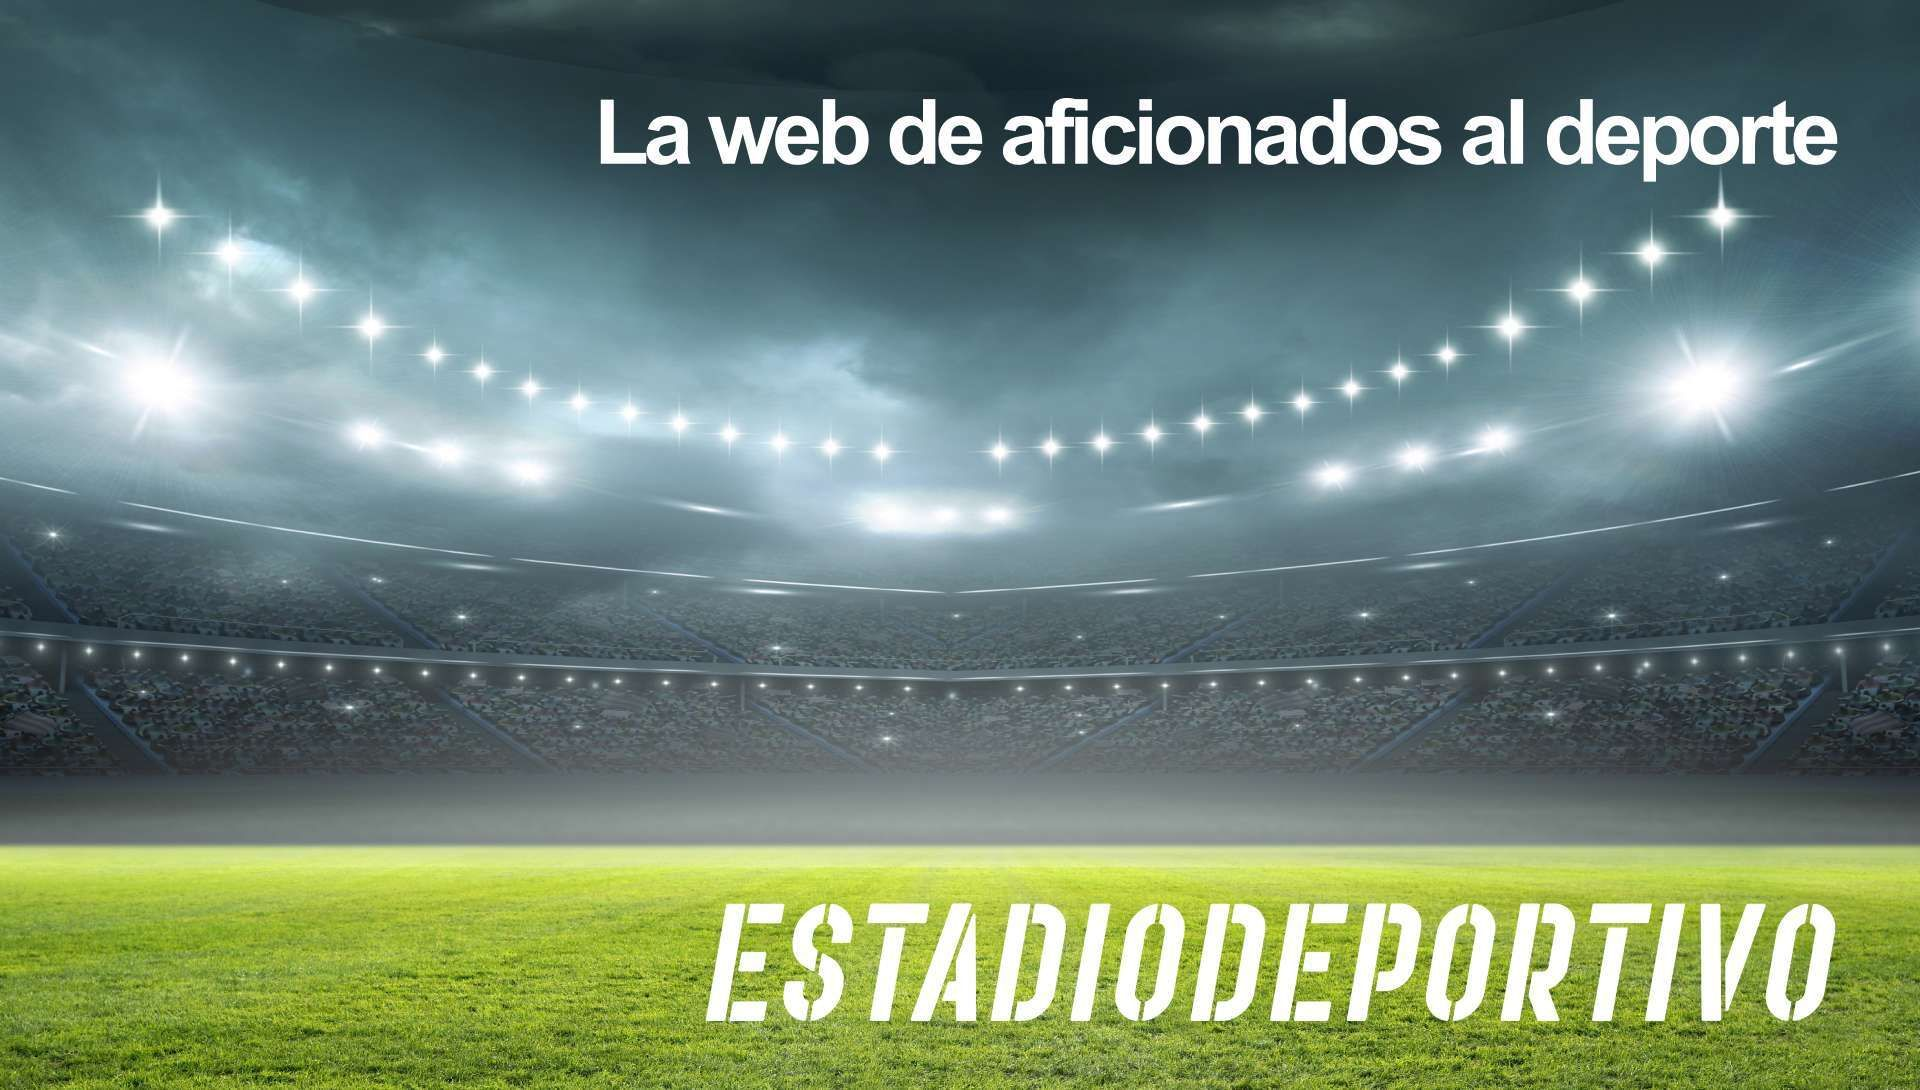 Los mejores momentos de Julen Lopetegui en el Sevilla FC